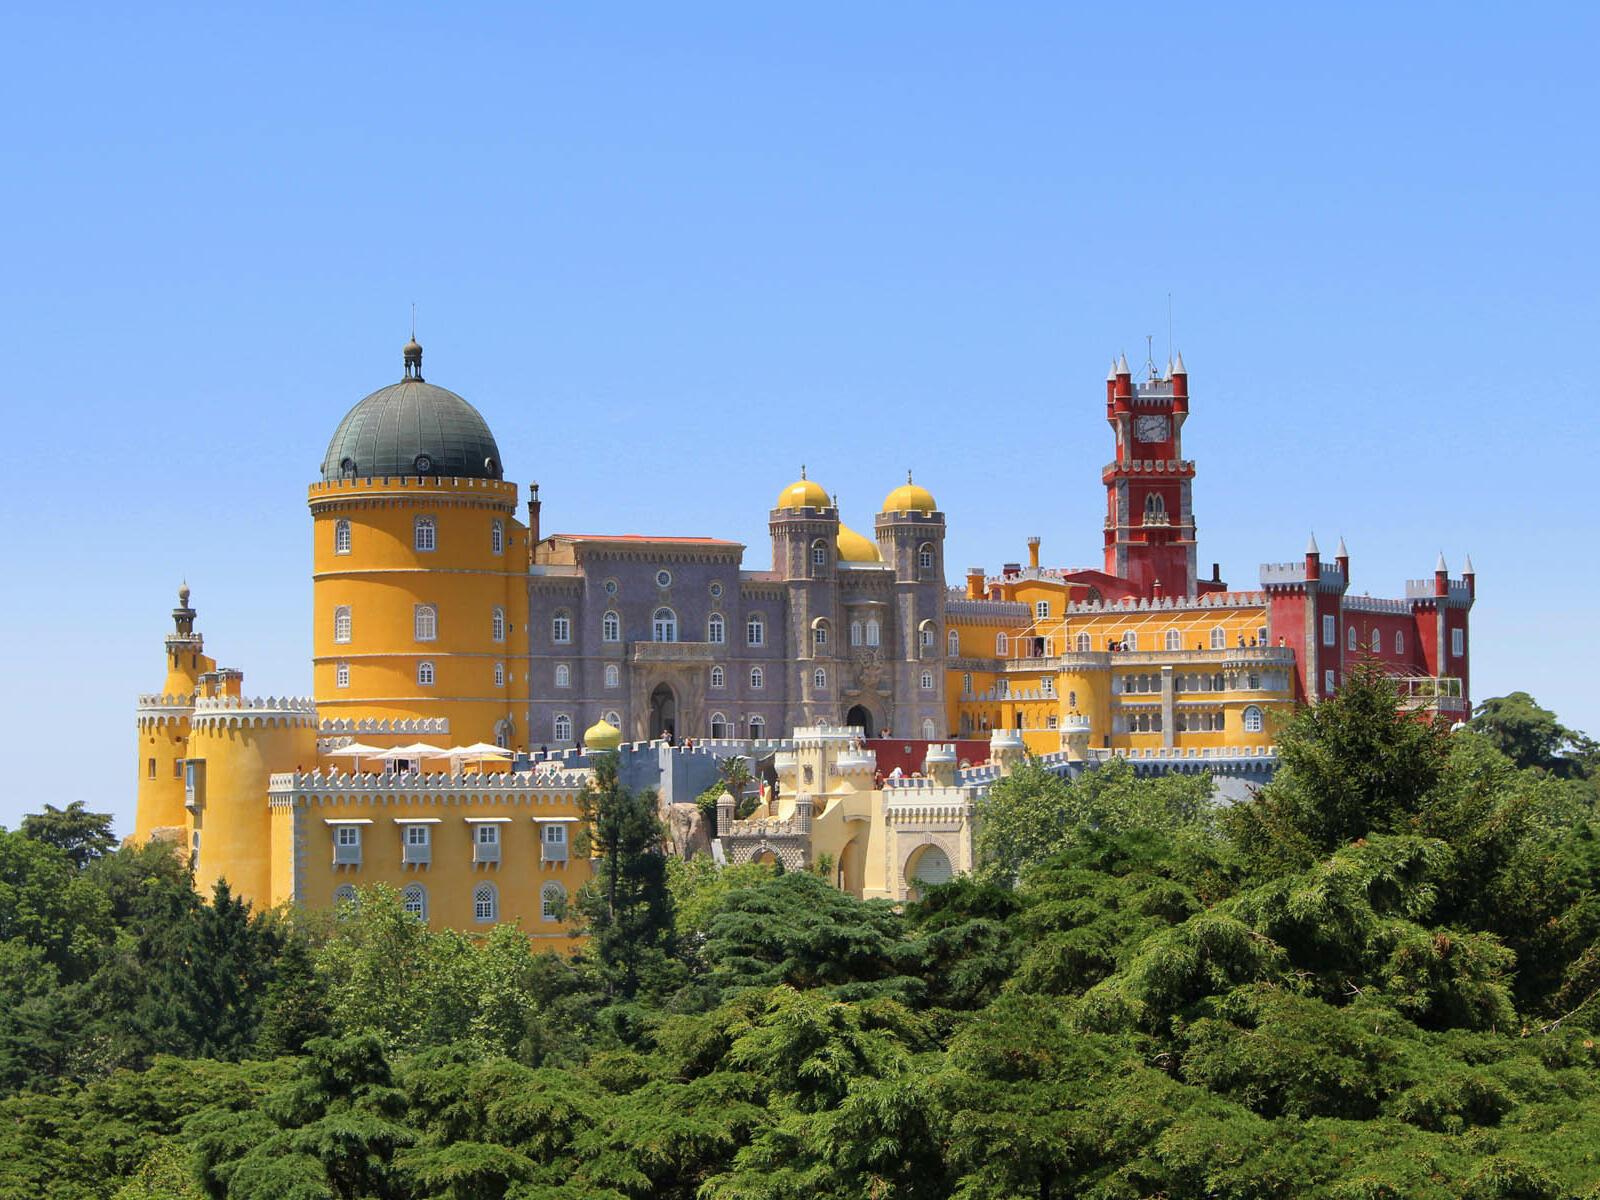 A Historic building in Portugal near Hotel Cascais Miragem